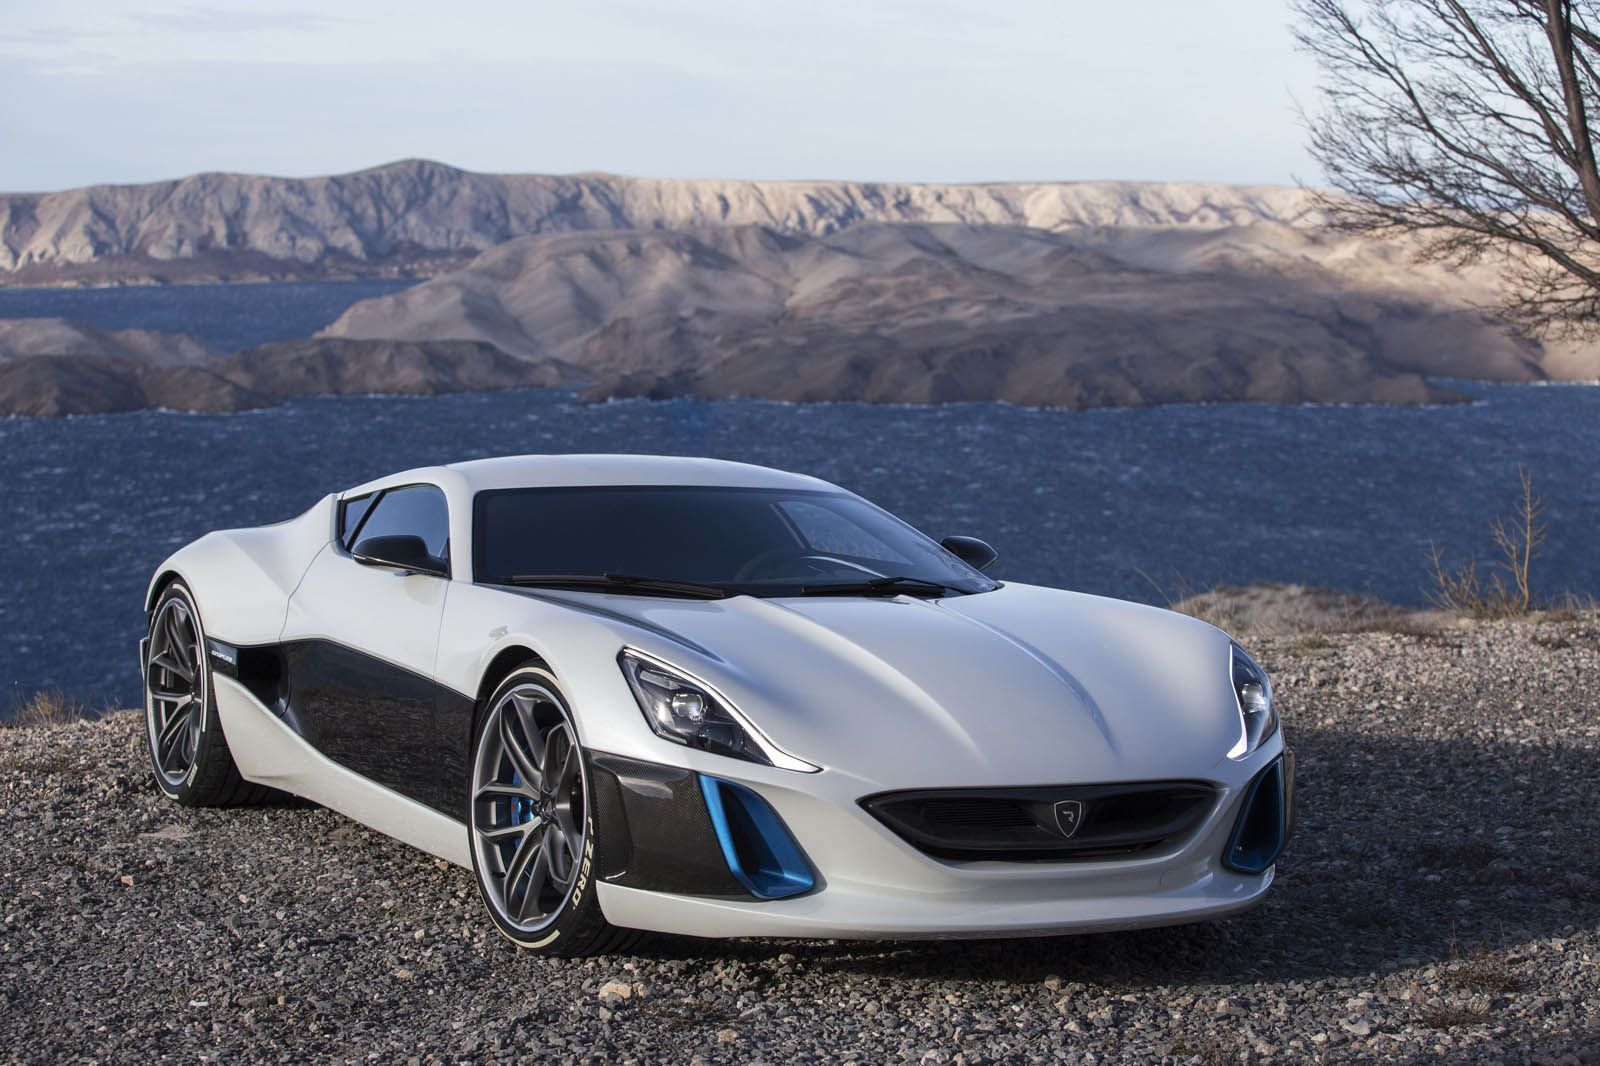 Super Car Brands In 2020 Luxury Hybrid Cars Super Cars Hybrid Car